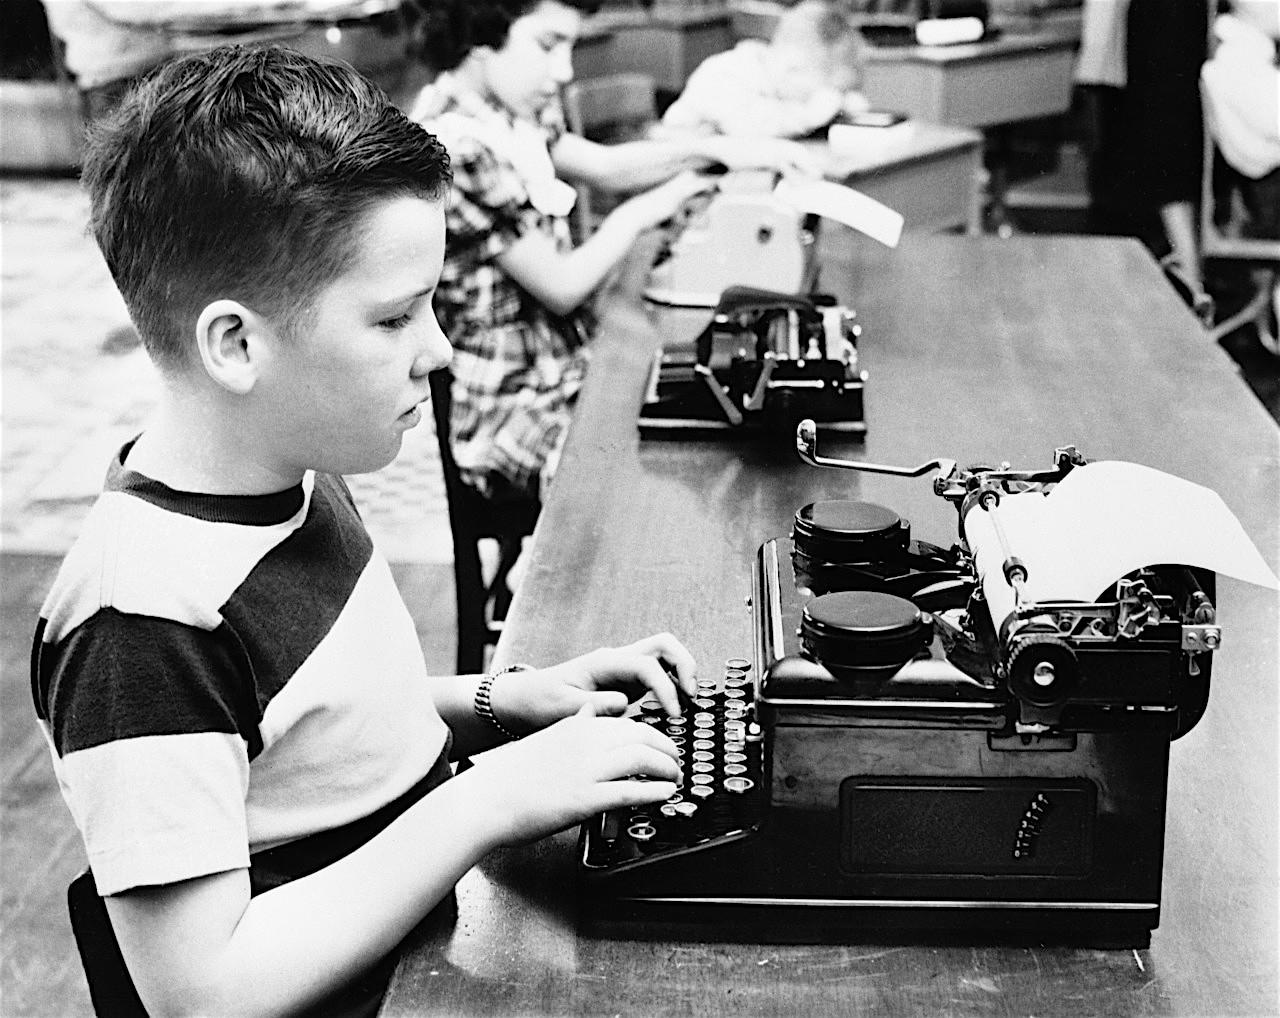 Boy and girl (6-7) using typewriters --- Image by © Bettmann/Corbis